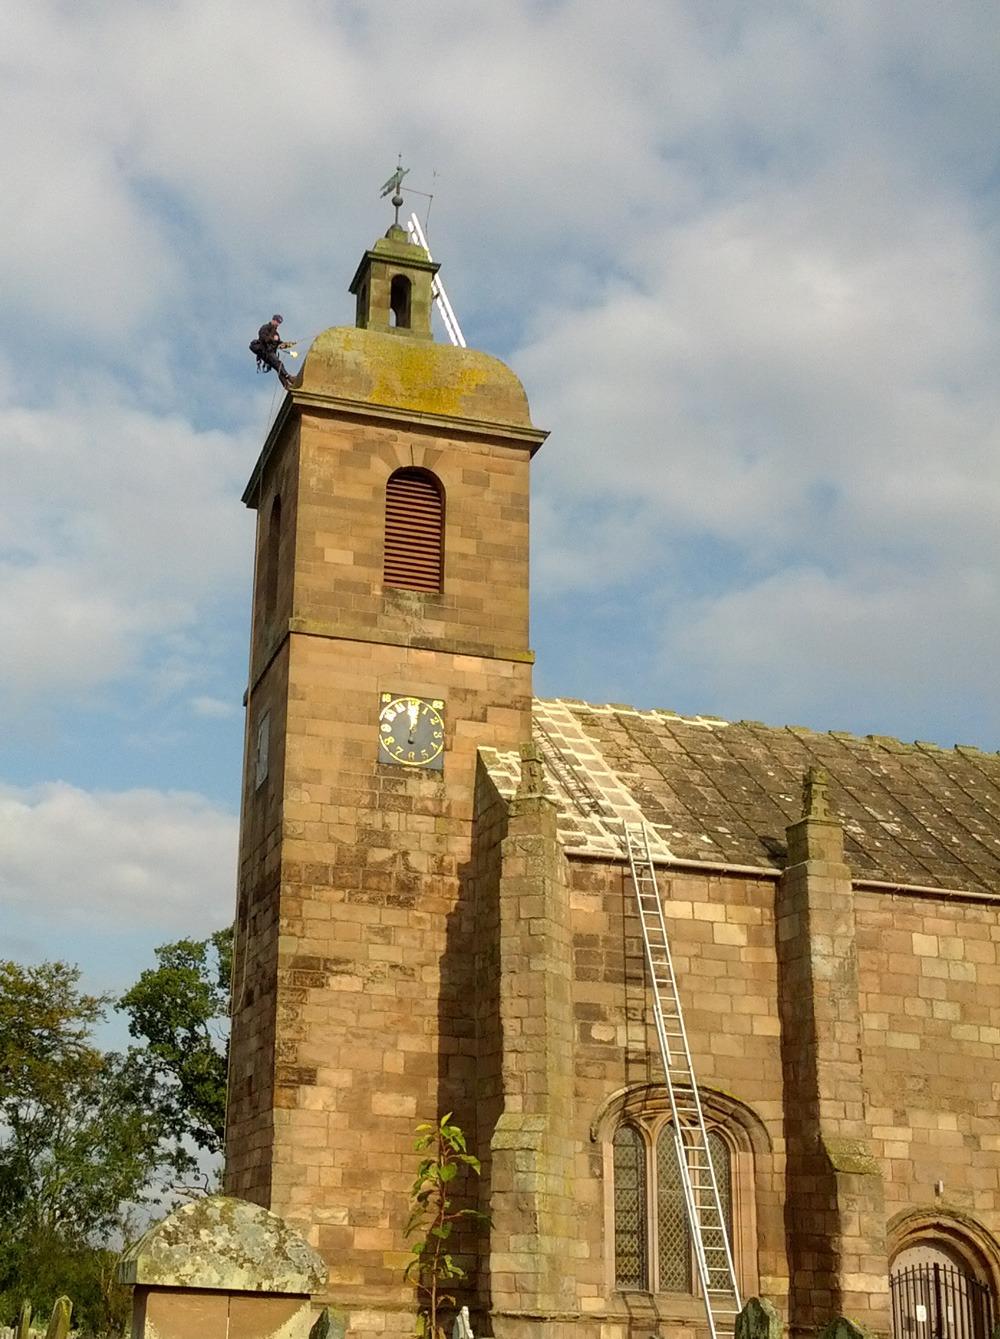 Church steeple inspection